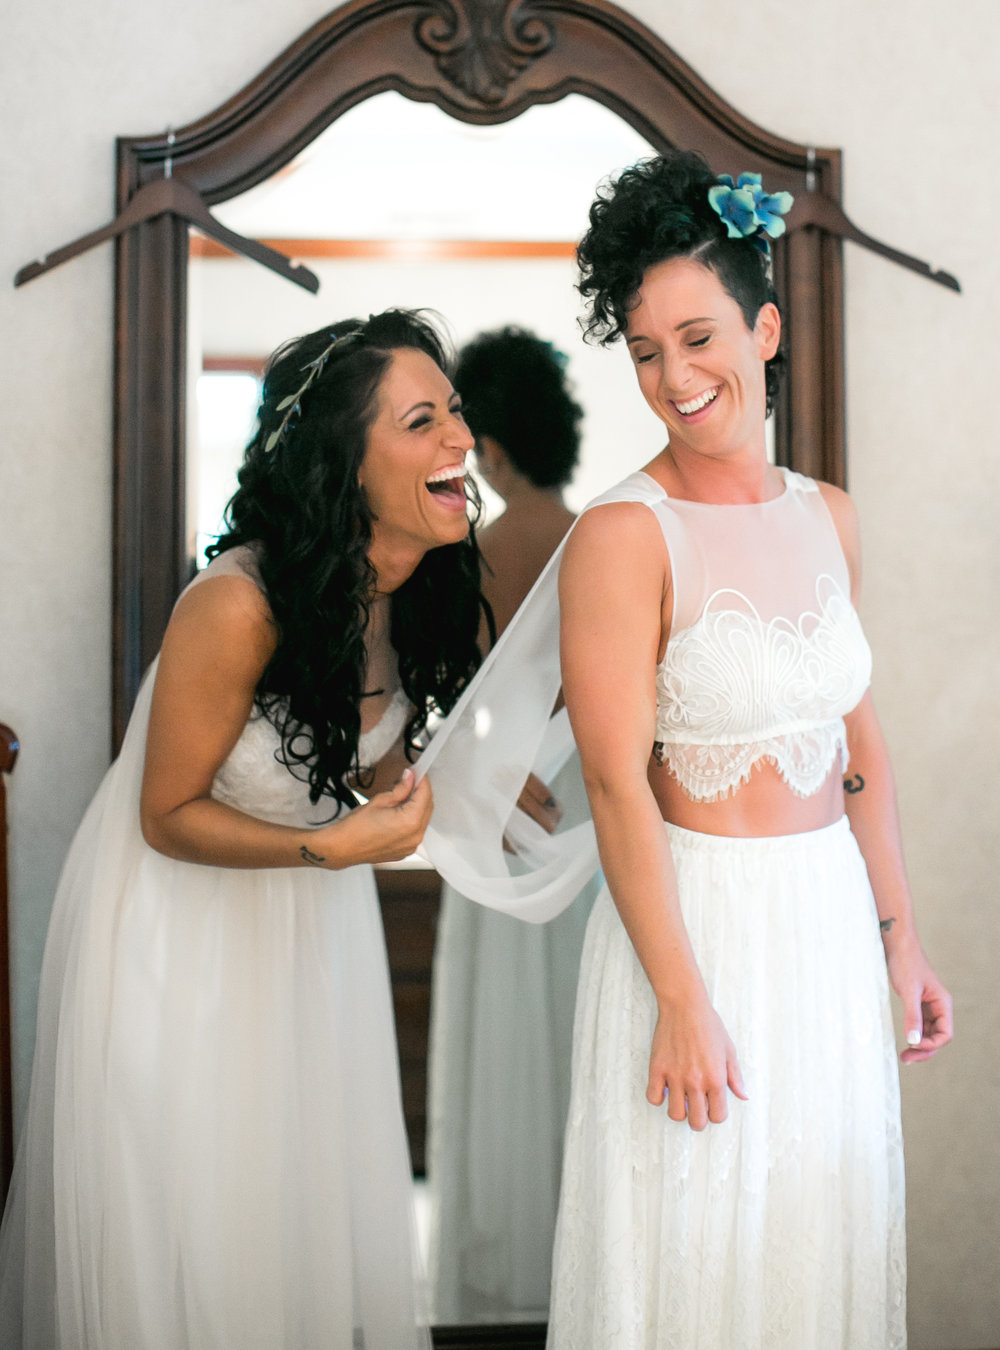 Sarah_and_Simone_WeddingReedit-4.jpg